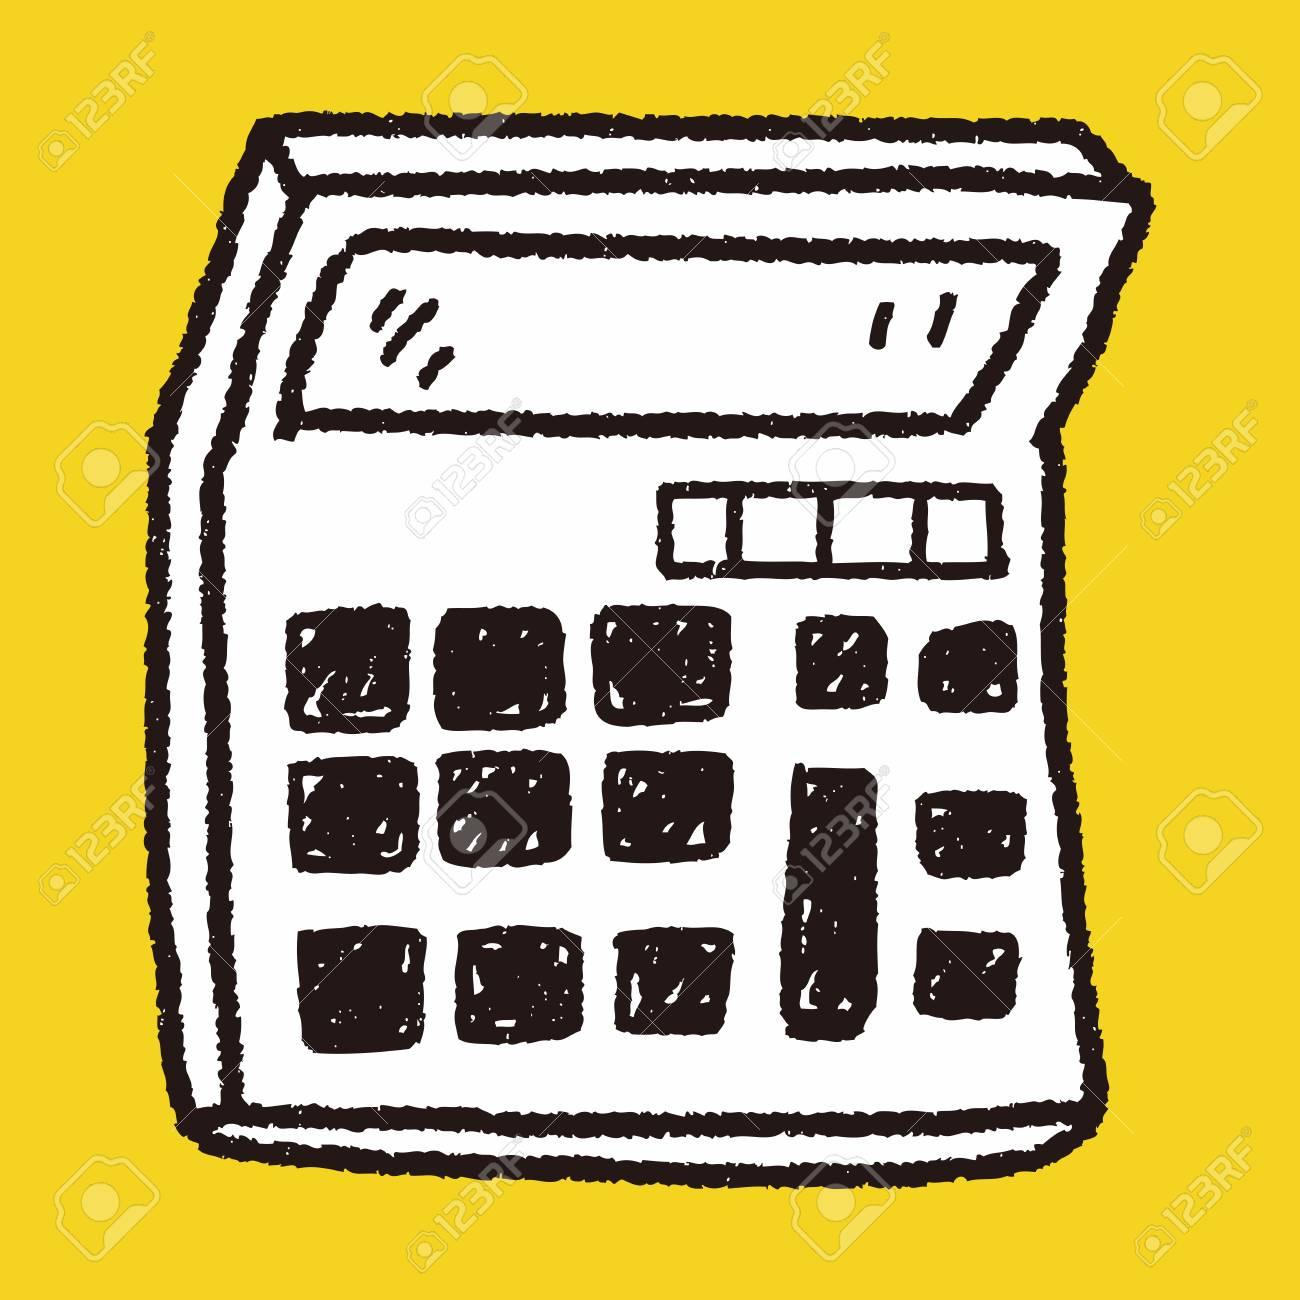 Calculator clipart doodle. Free download clip art